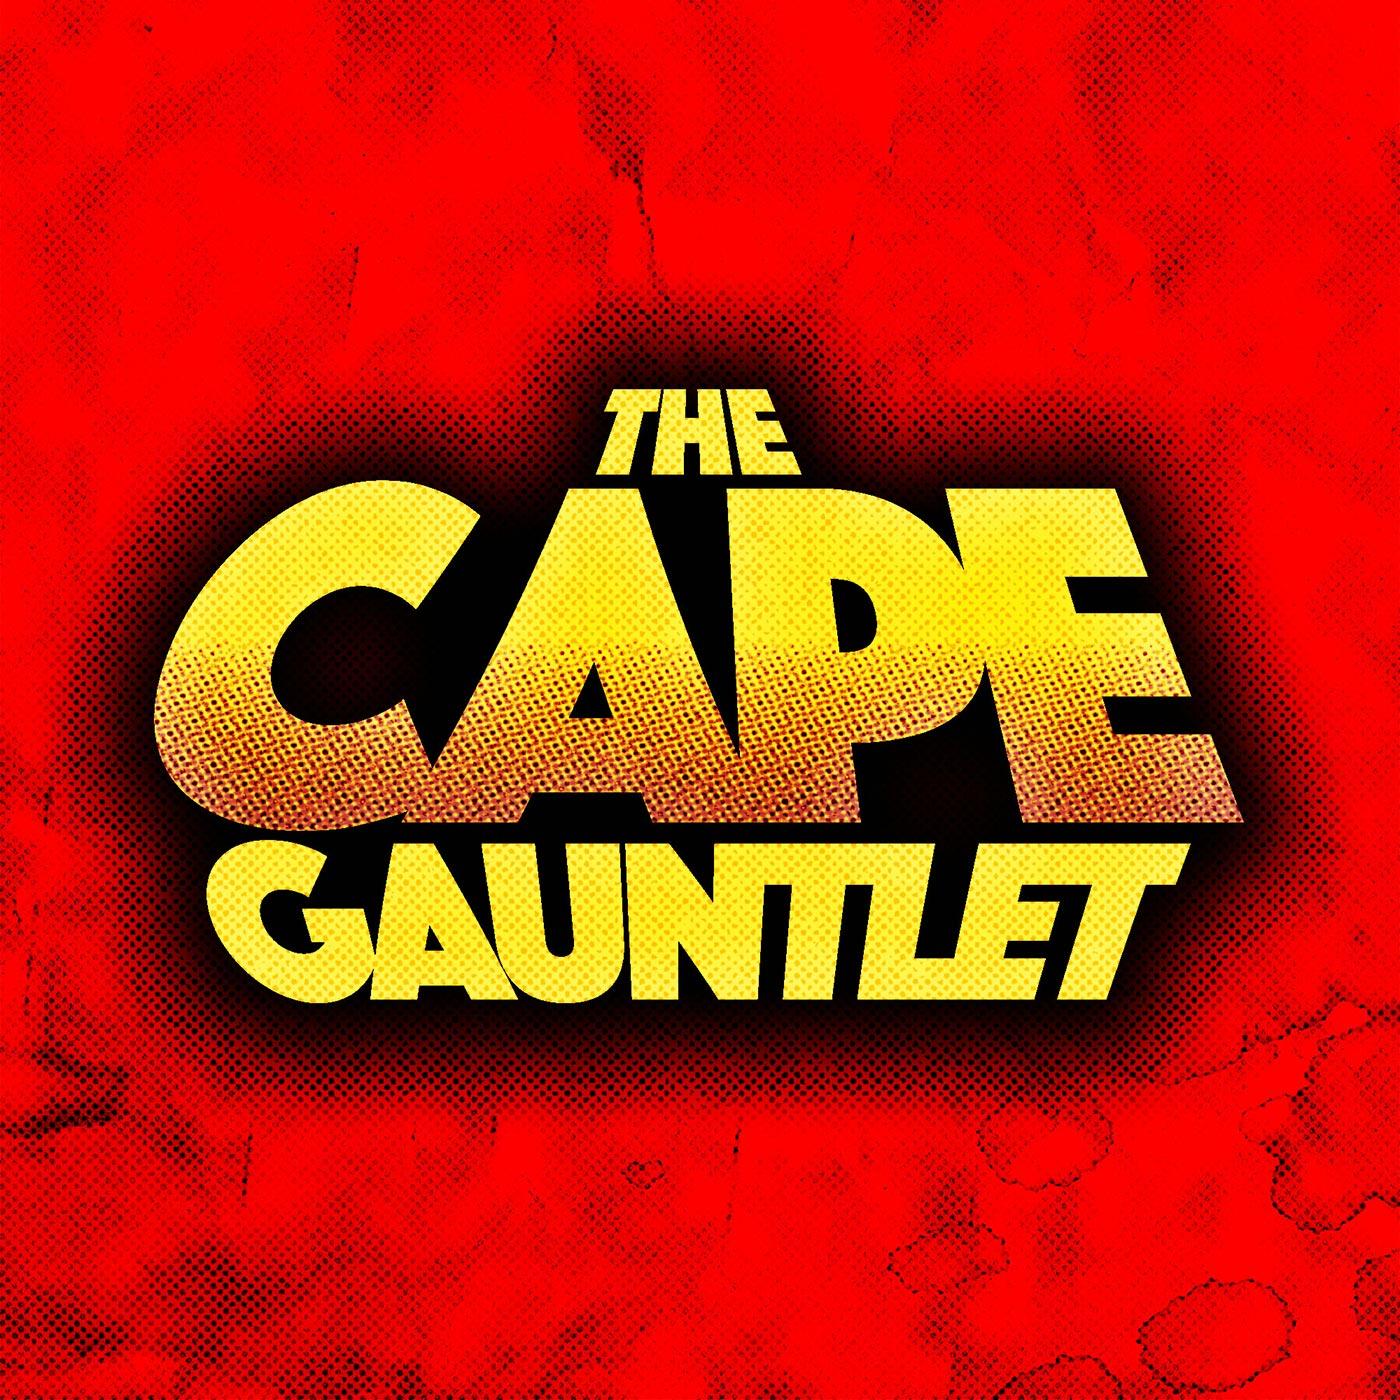 The Cape Gauntlet